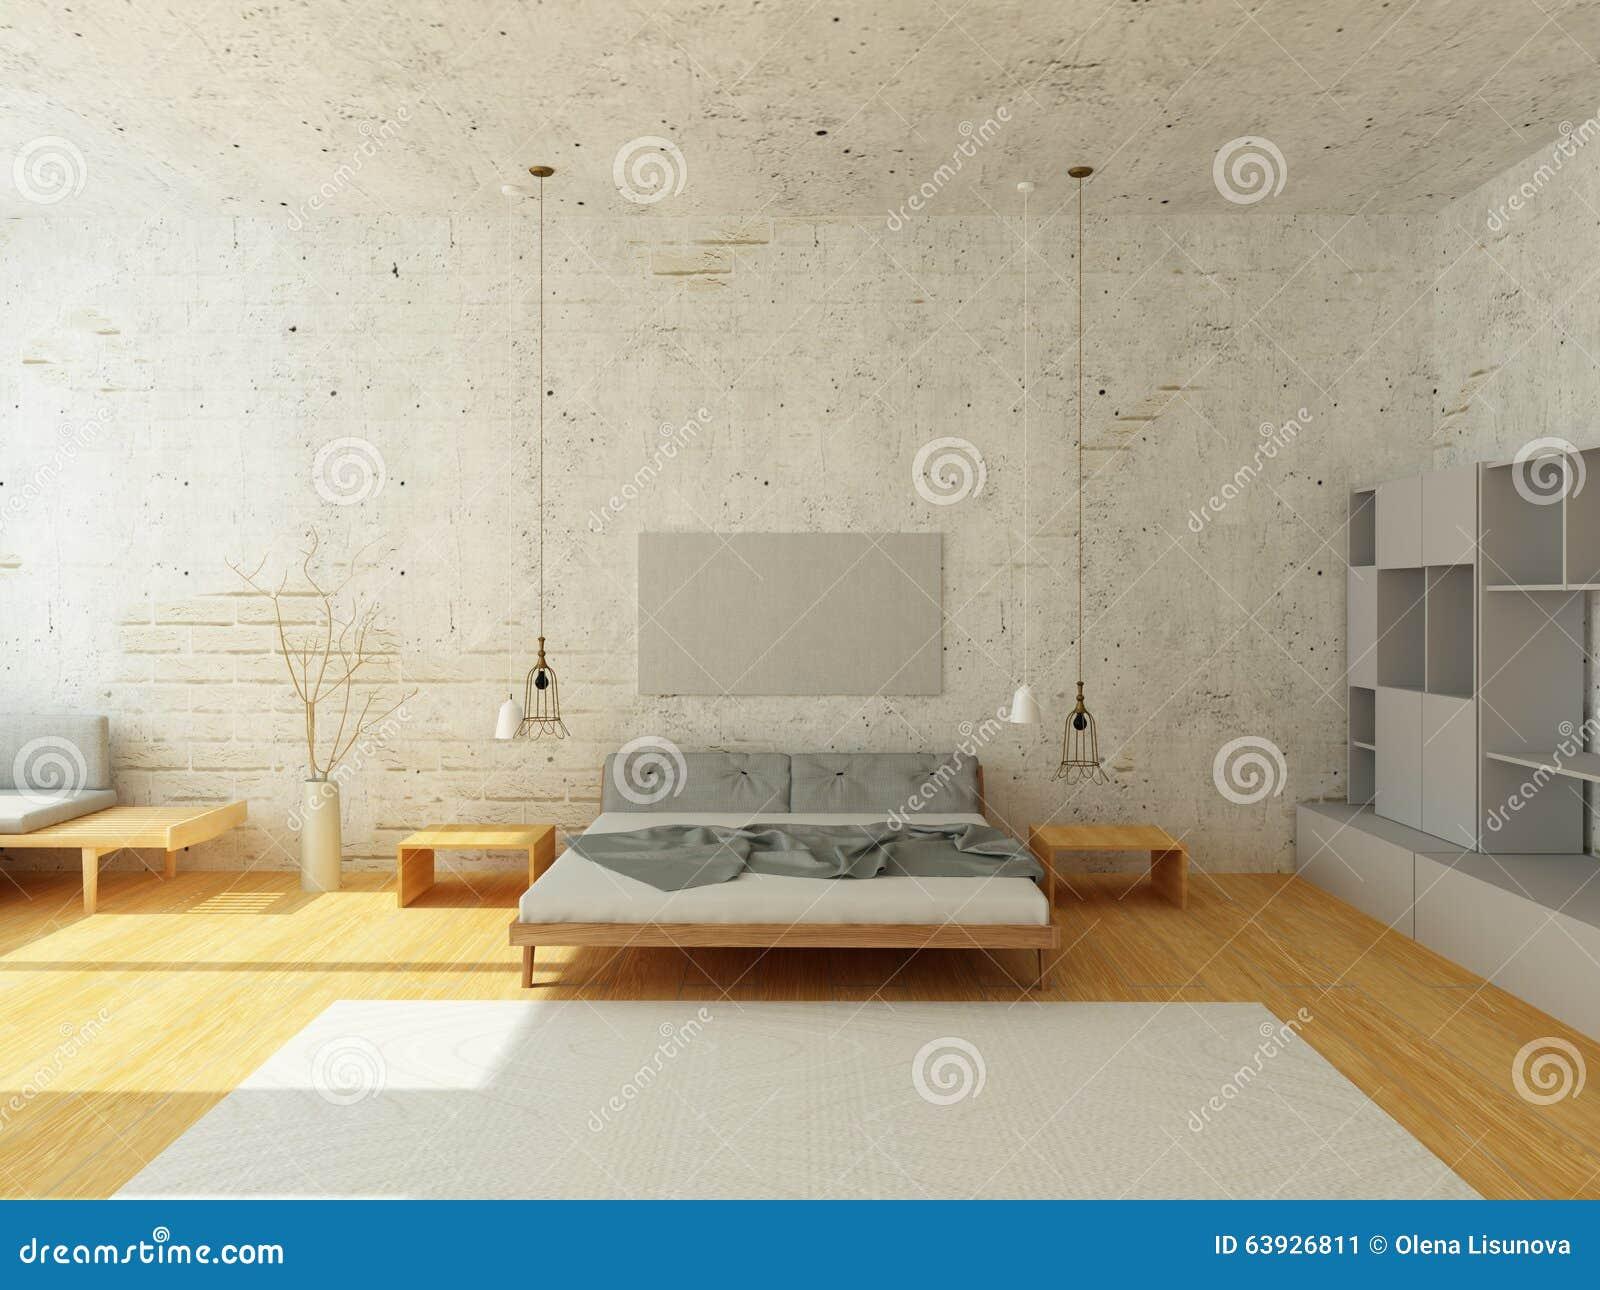 Cozy Interior Of Bedroom In Scandinavian Style. Cozy Bedroom With Stucco  Brick Walls ...